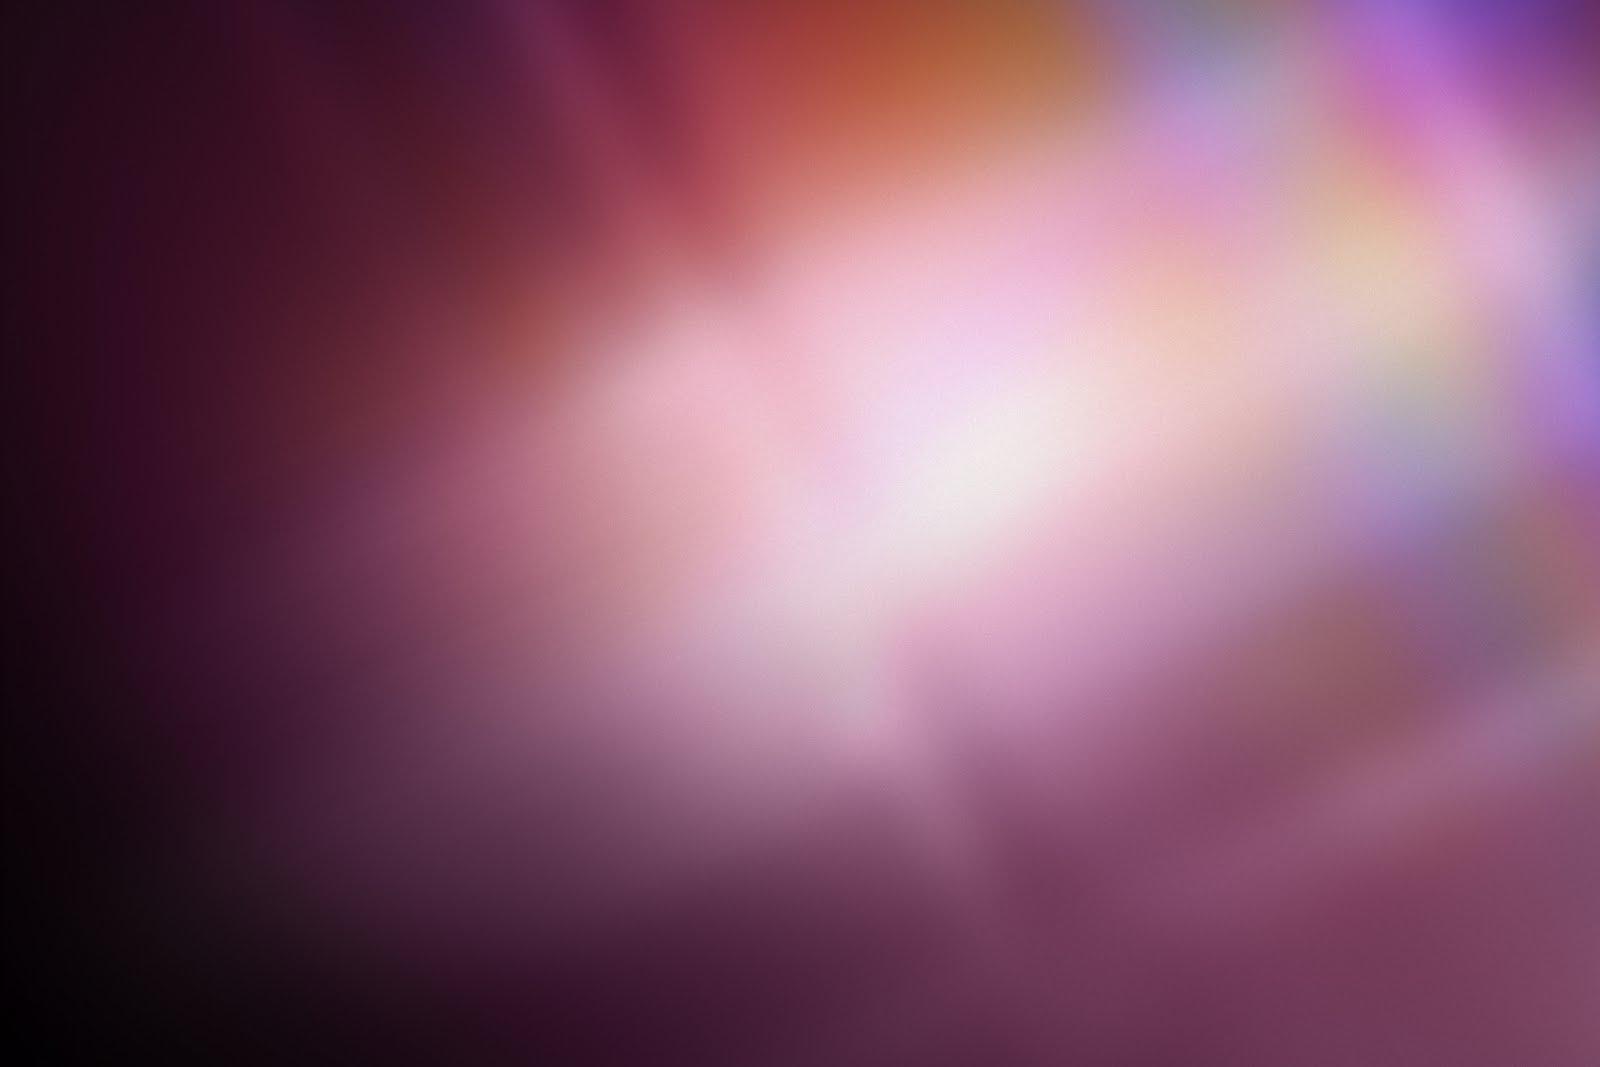 http://3.bp.blogspot.com/_2Mg-dNAi-F4/TKrqgwA7qgI/AAAAAAAAAAw/jrLQ6uLDEf4/s1600/Ubuntu%2B10-10%2Bdefault%2Bwallpaper%2Blarge.jpg